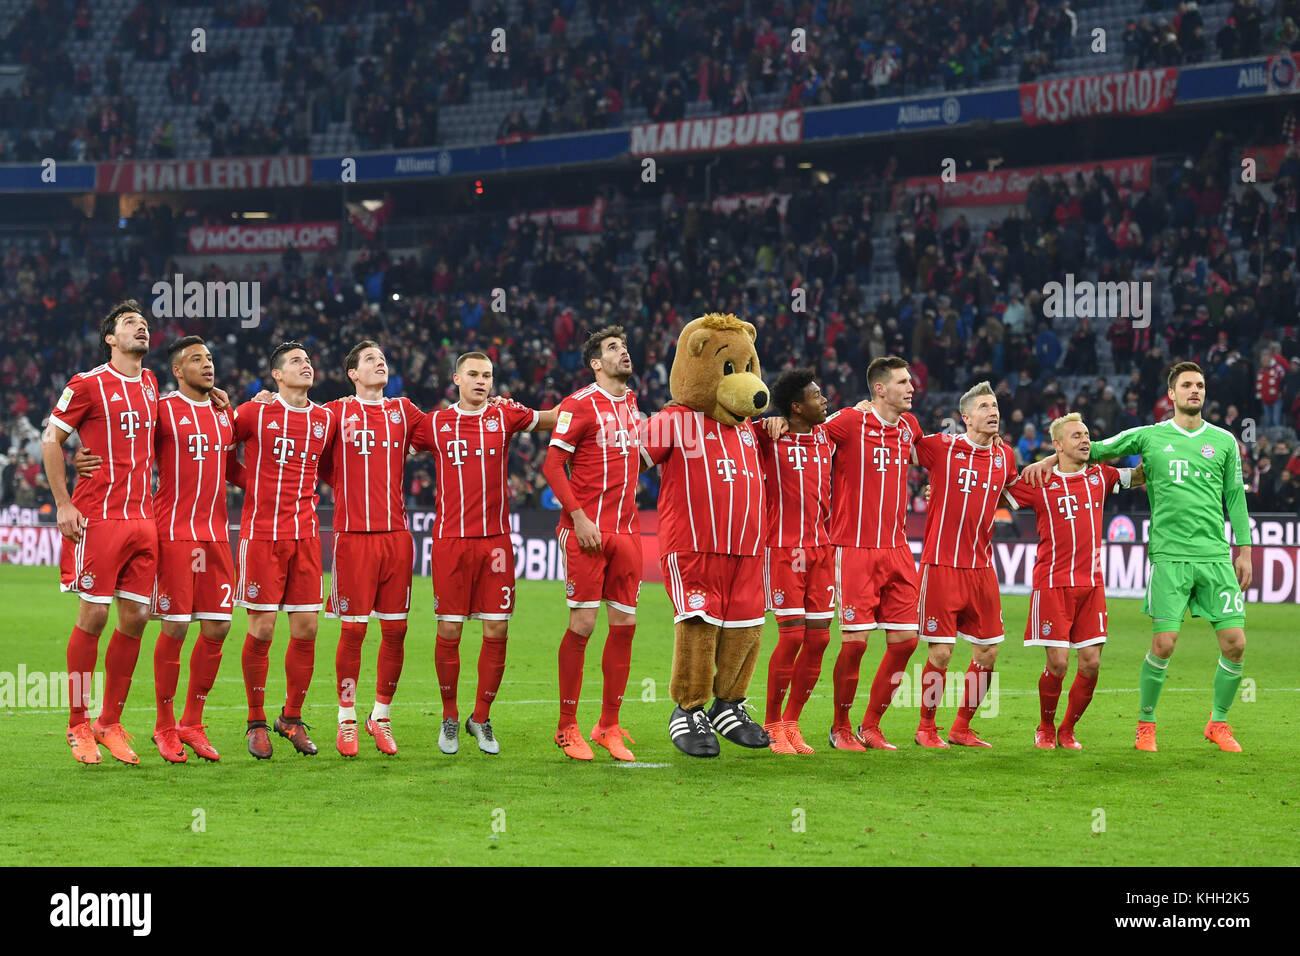 final jubilation, Freudentanz, Teamfoto, Team, Mannschaft, Mannschaftsfoto der Bayern Spieler, Aktion, jubilation, - Stock Image